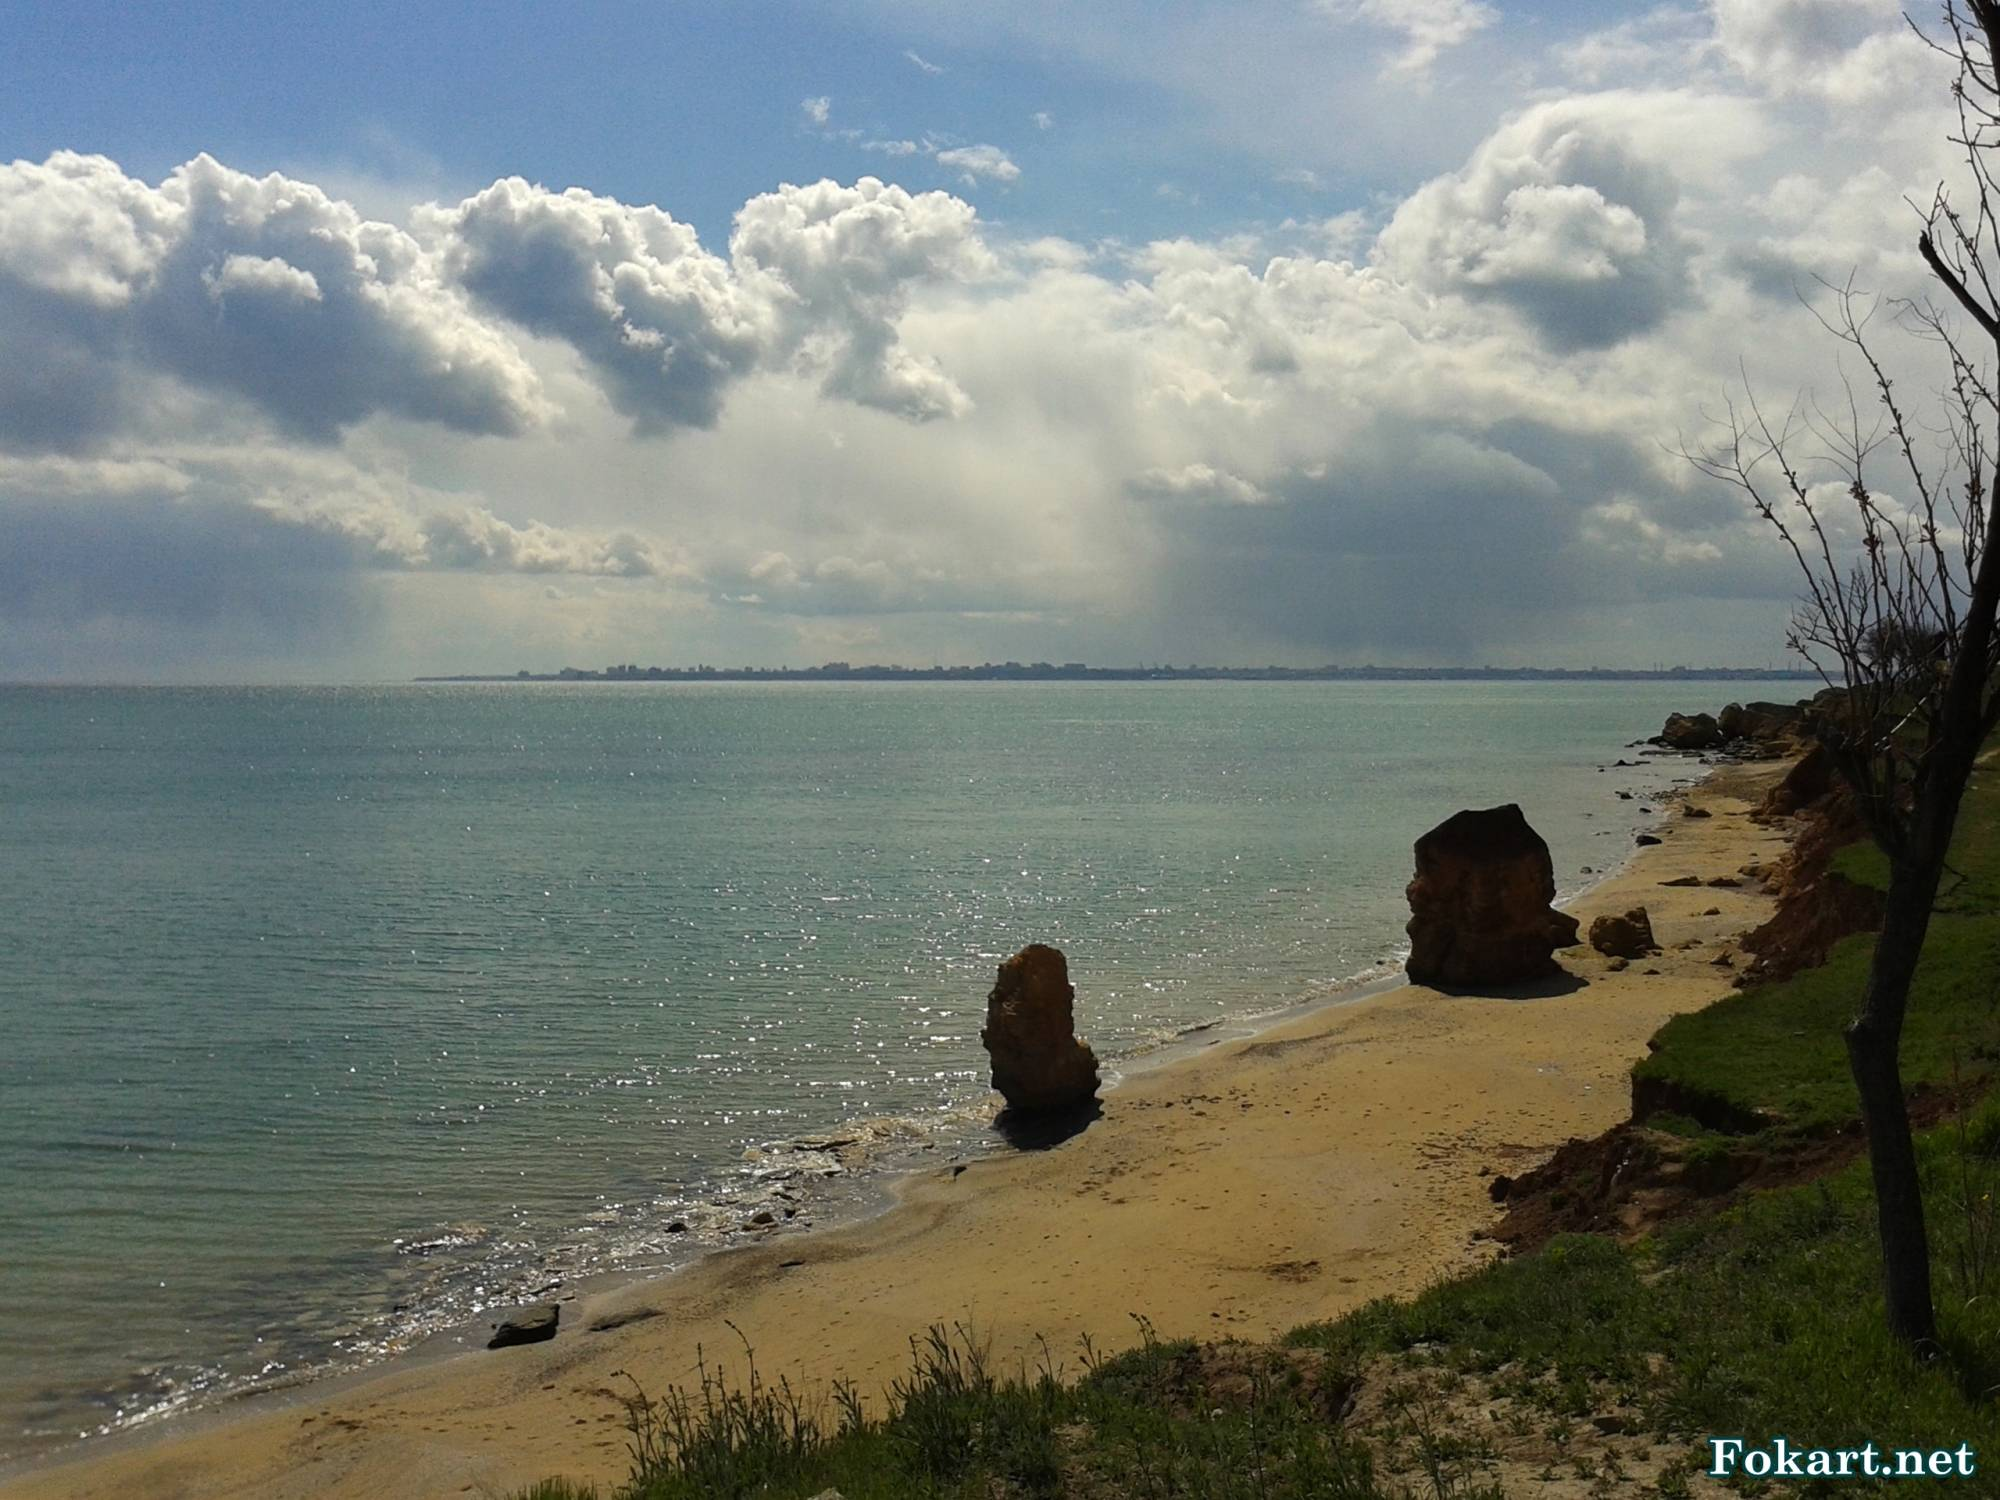 Вид с берега в окрестностях Фонтанки